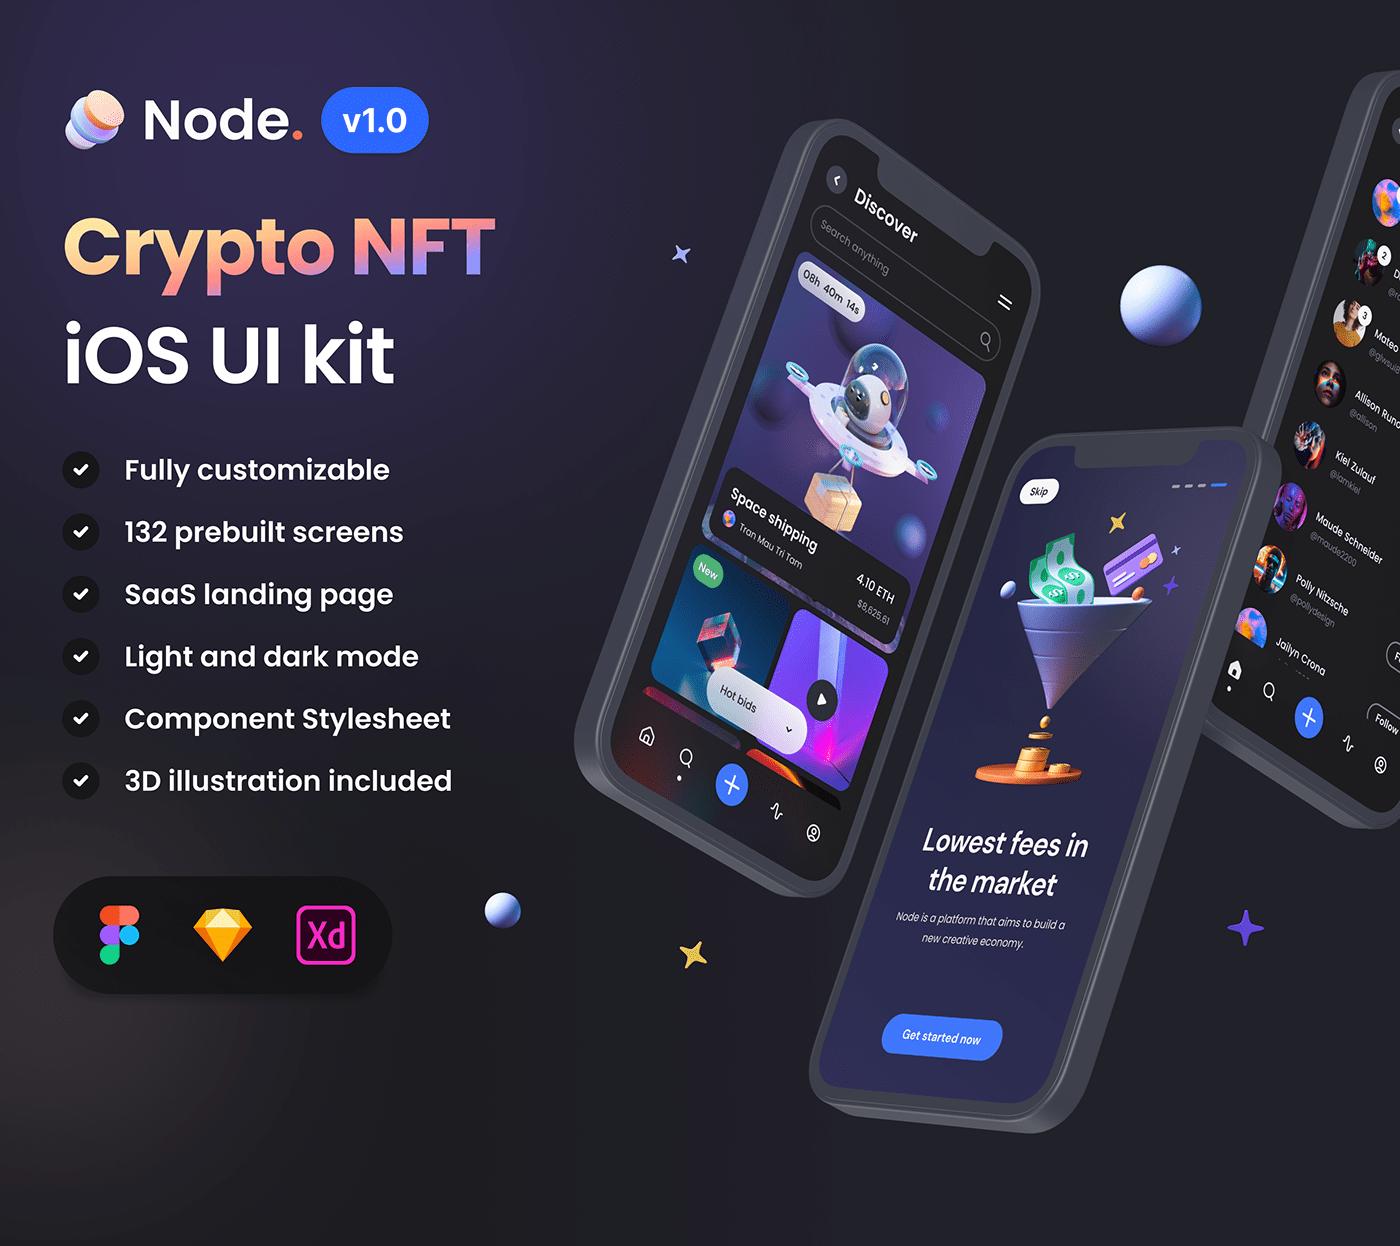 app crypto download exchange figma resource ios mobile Mobile app nft ui kit